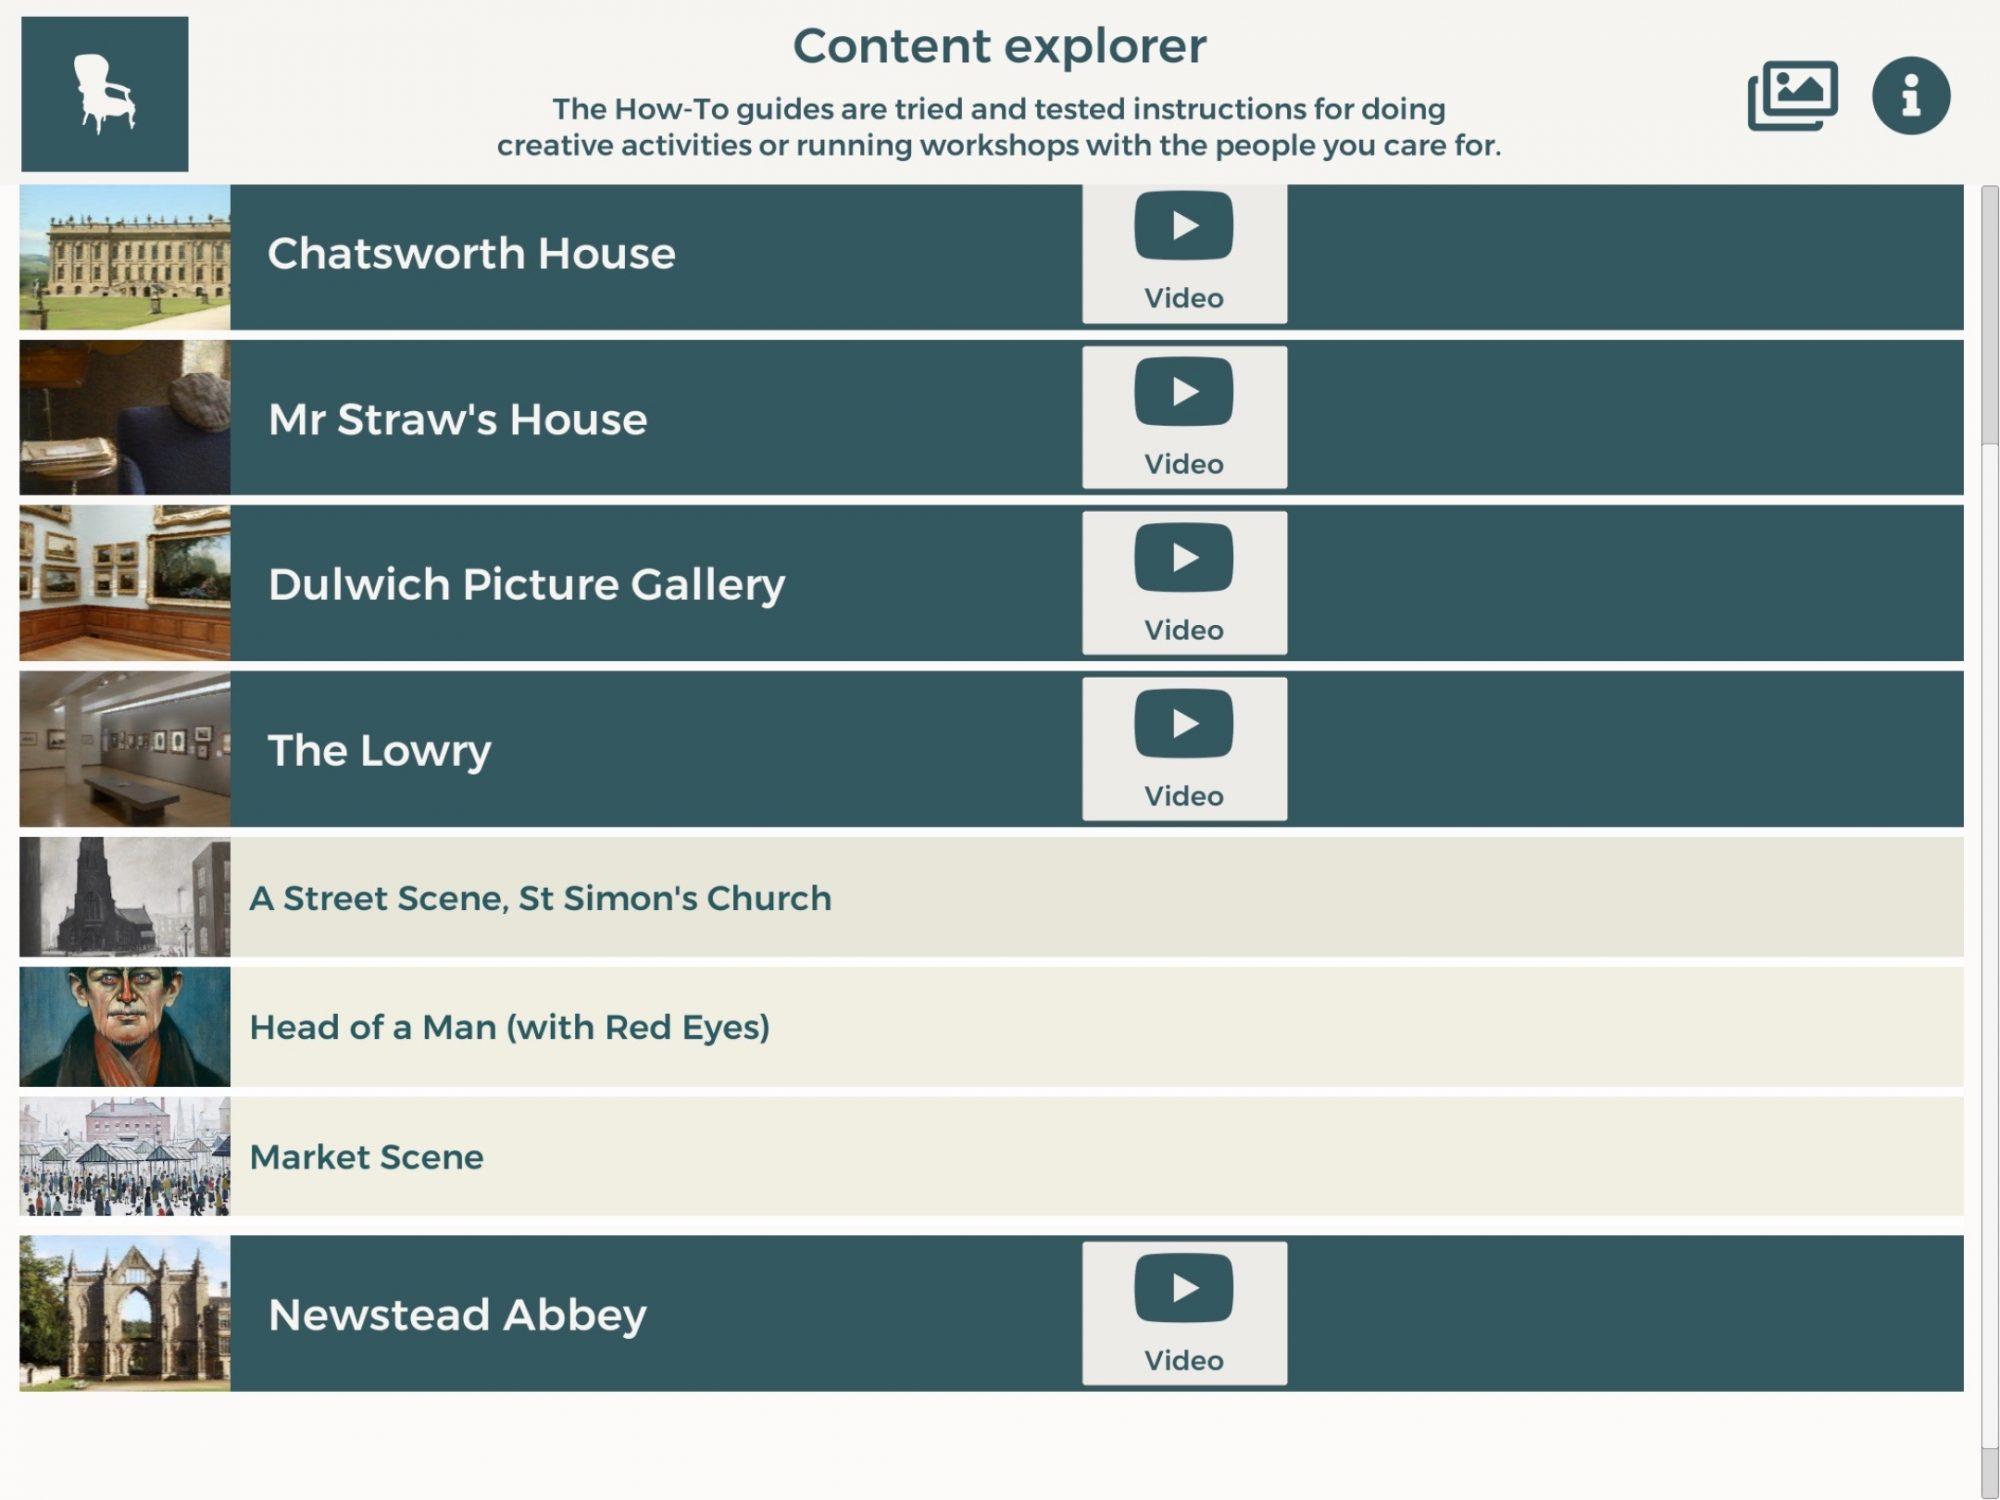 Choosing an artefect in the Armchair Gallery 'Content Explorer'